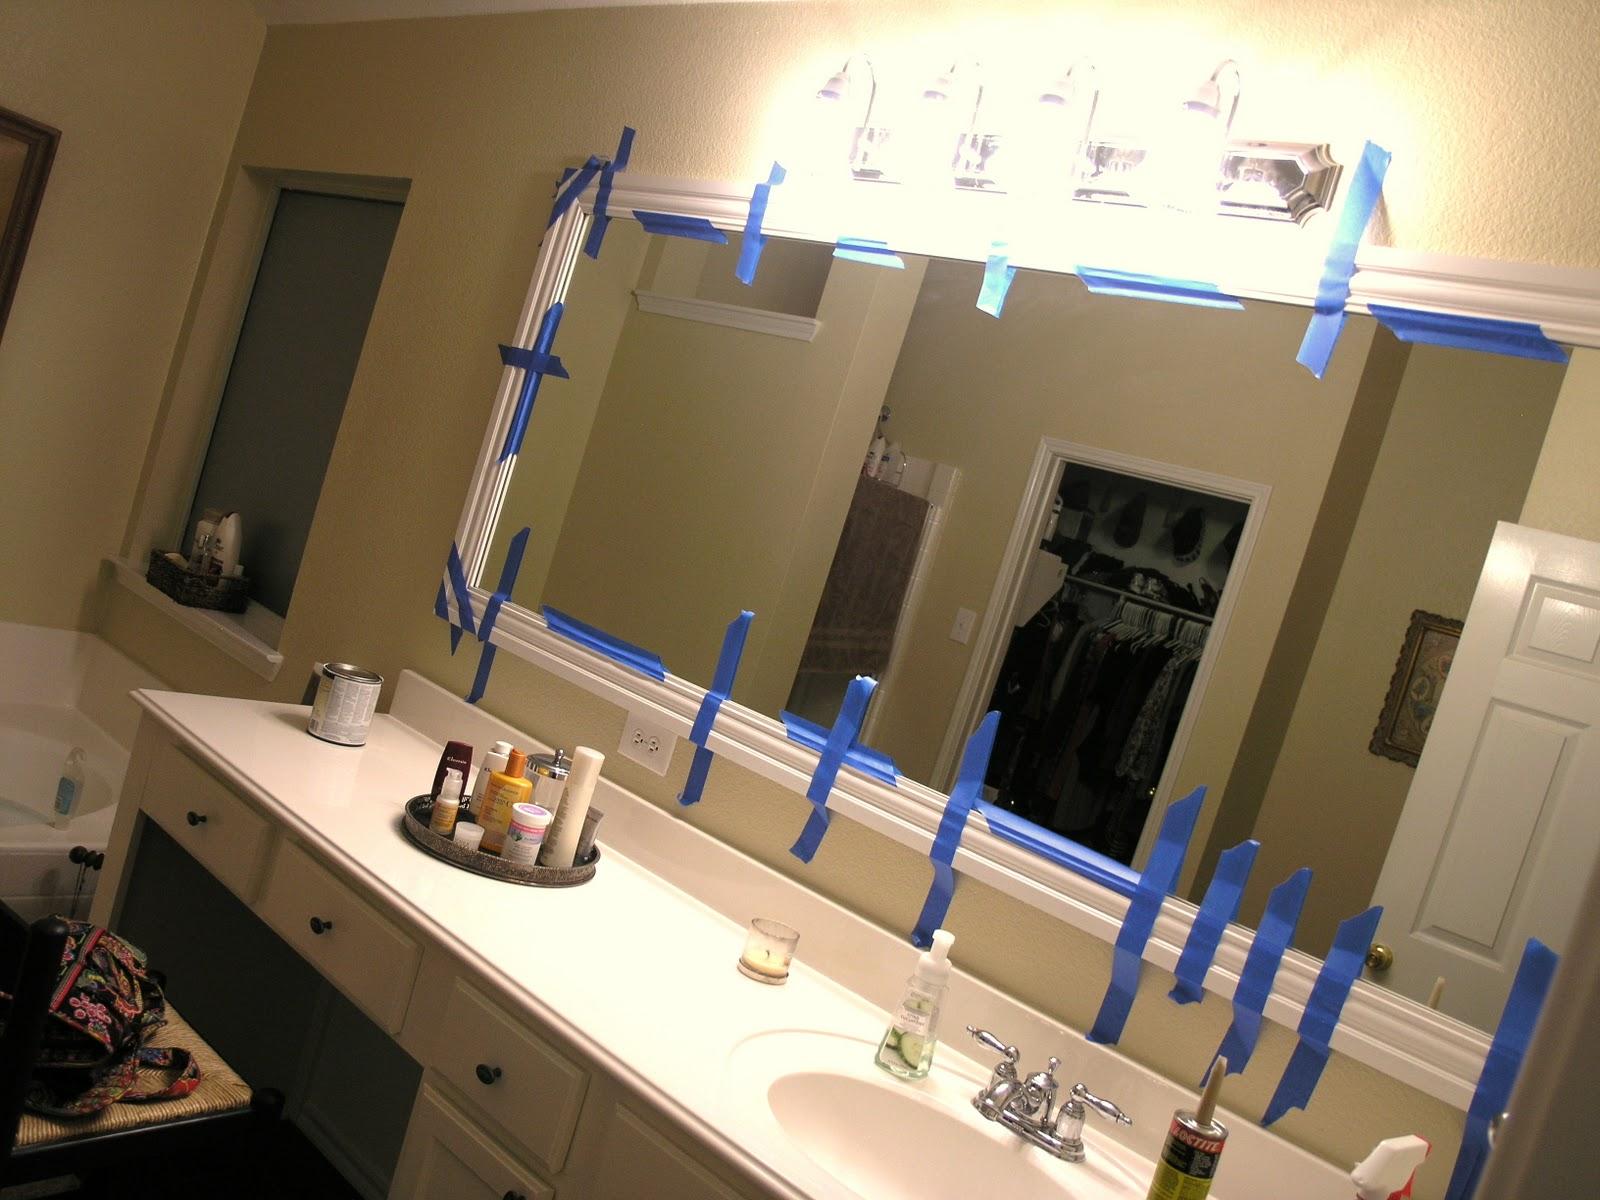 Baseboard Around Bathroom Vanity Images Bathroom Baseboard - Baseboard around bathroom vanity